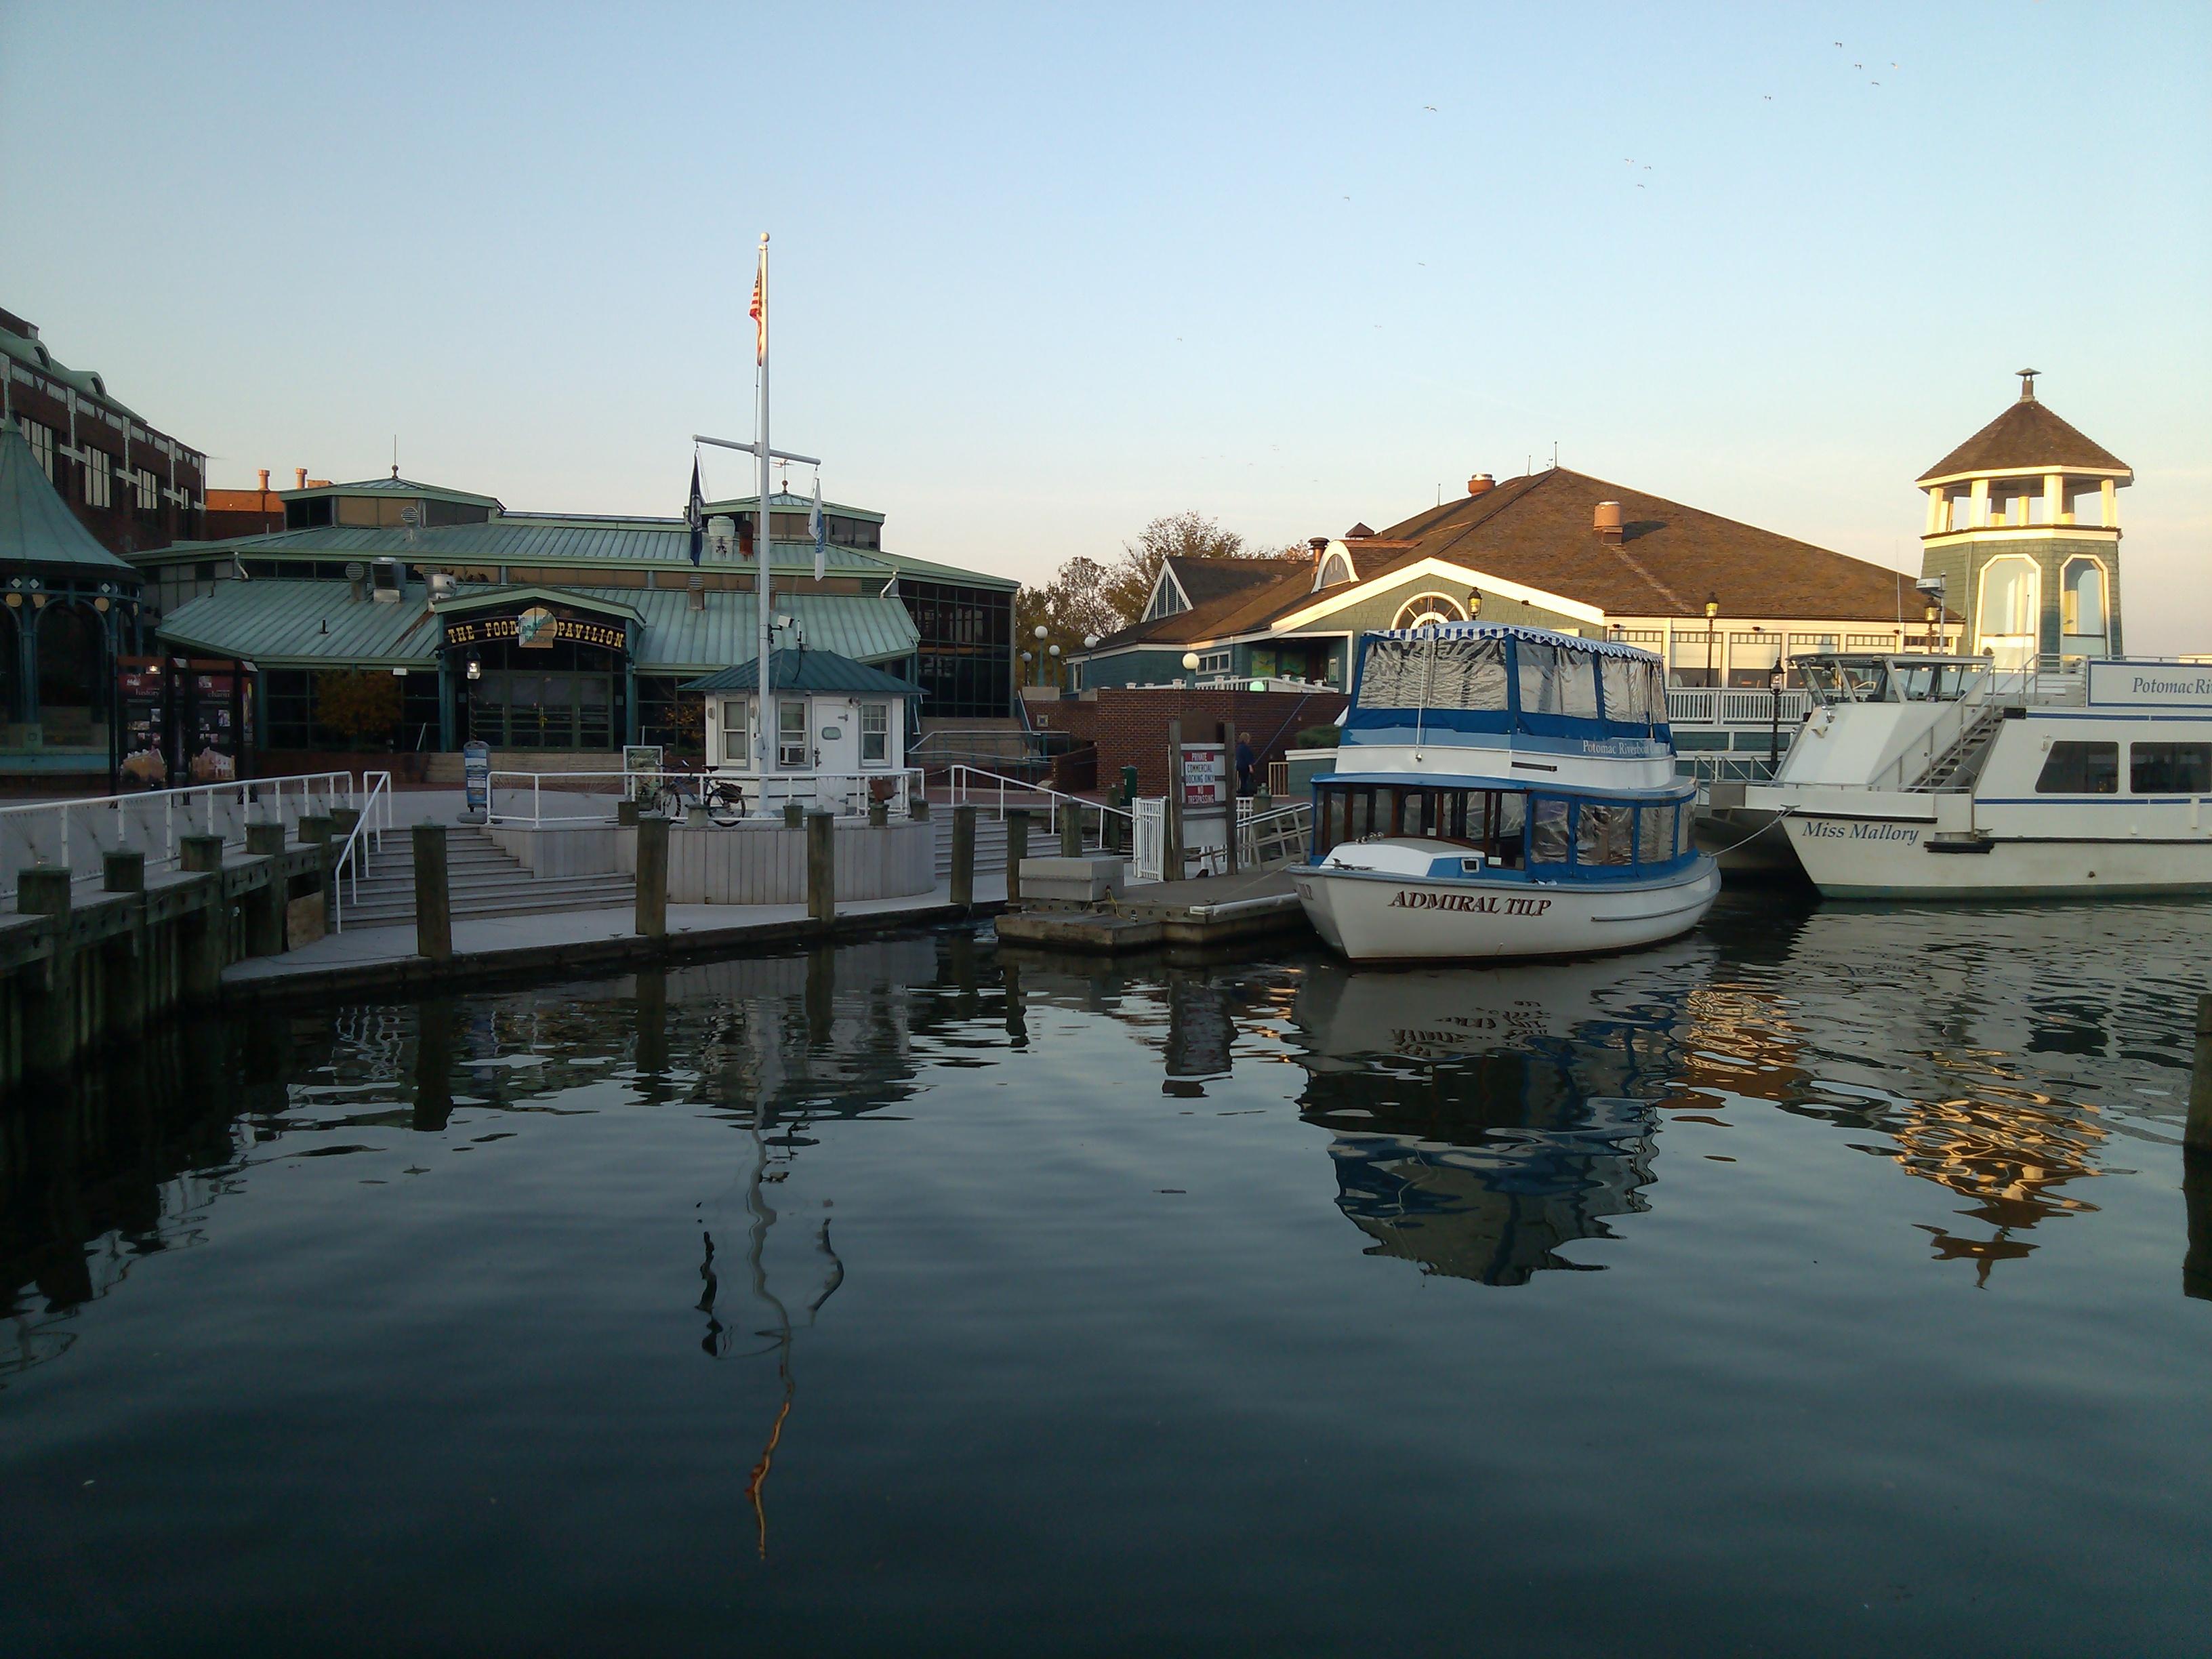 Old Town Alexandria has water taxi's to Washington DC